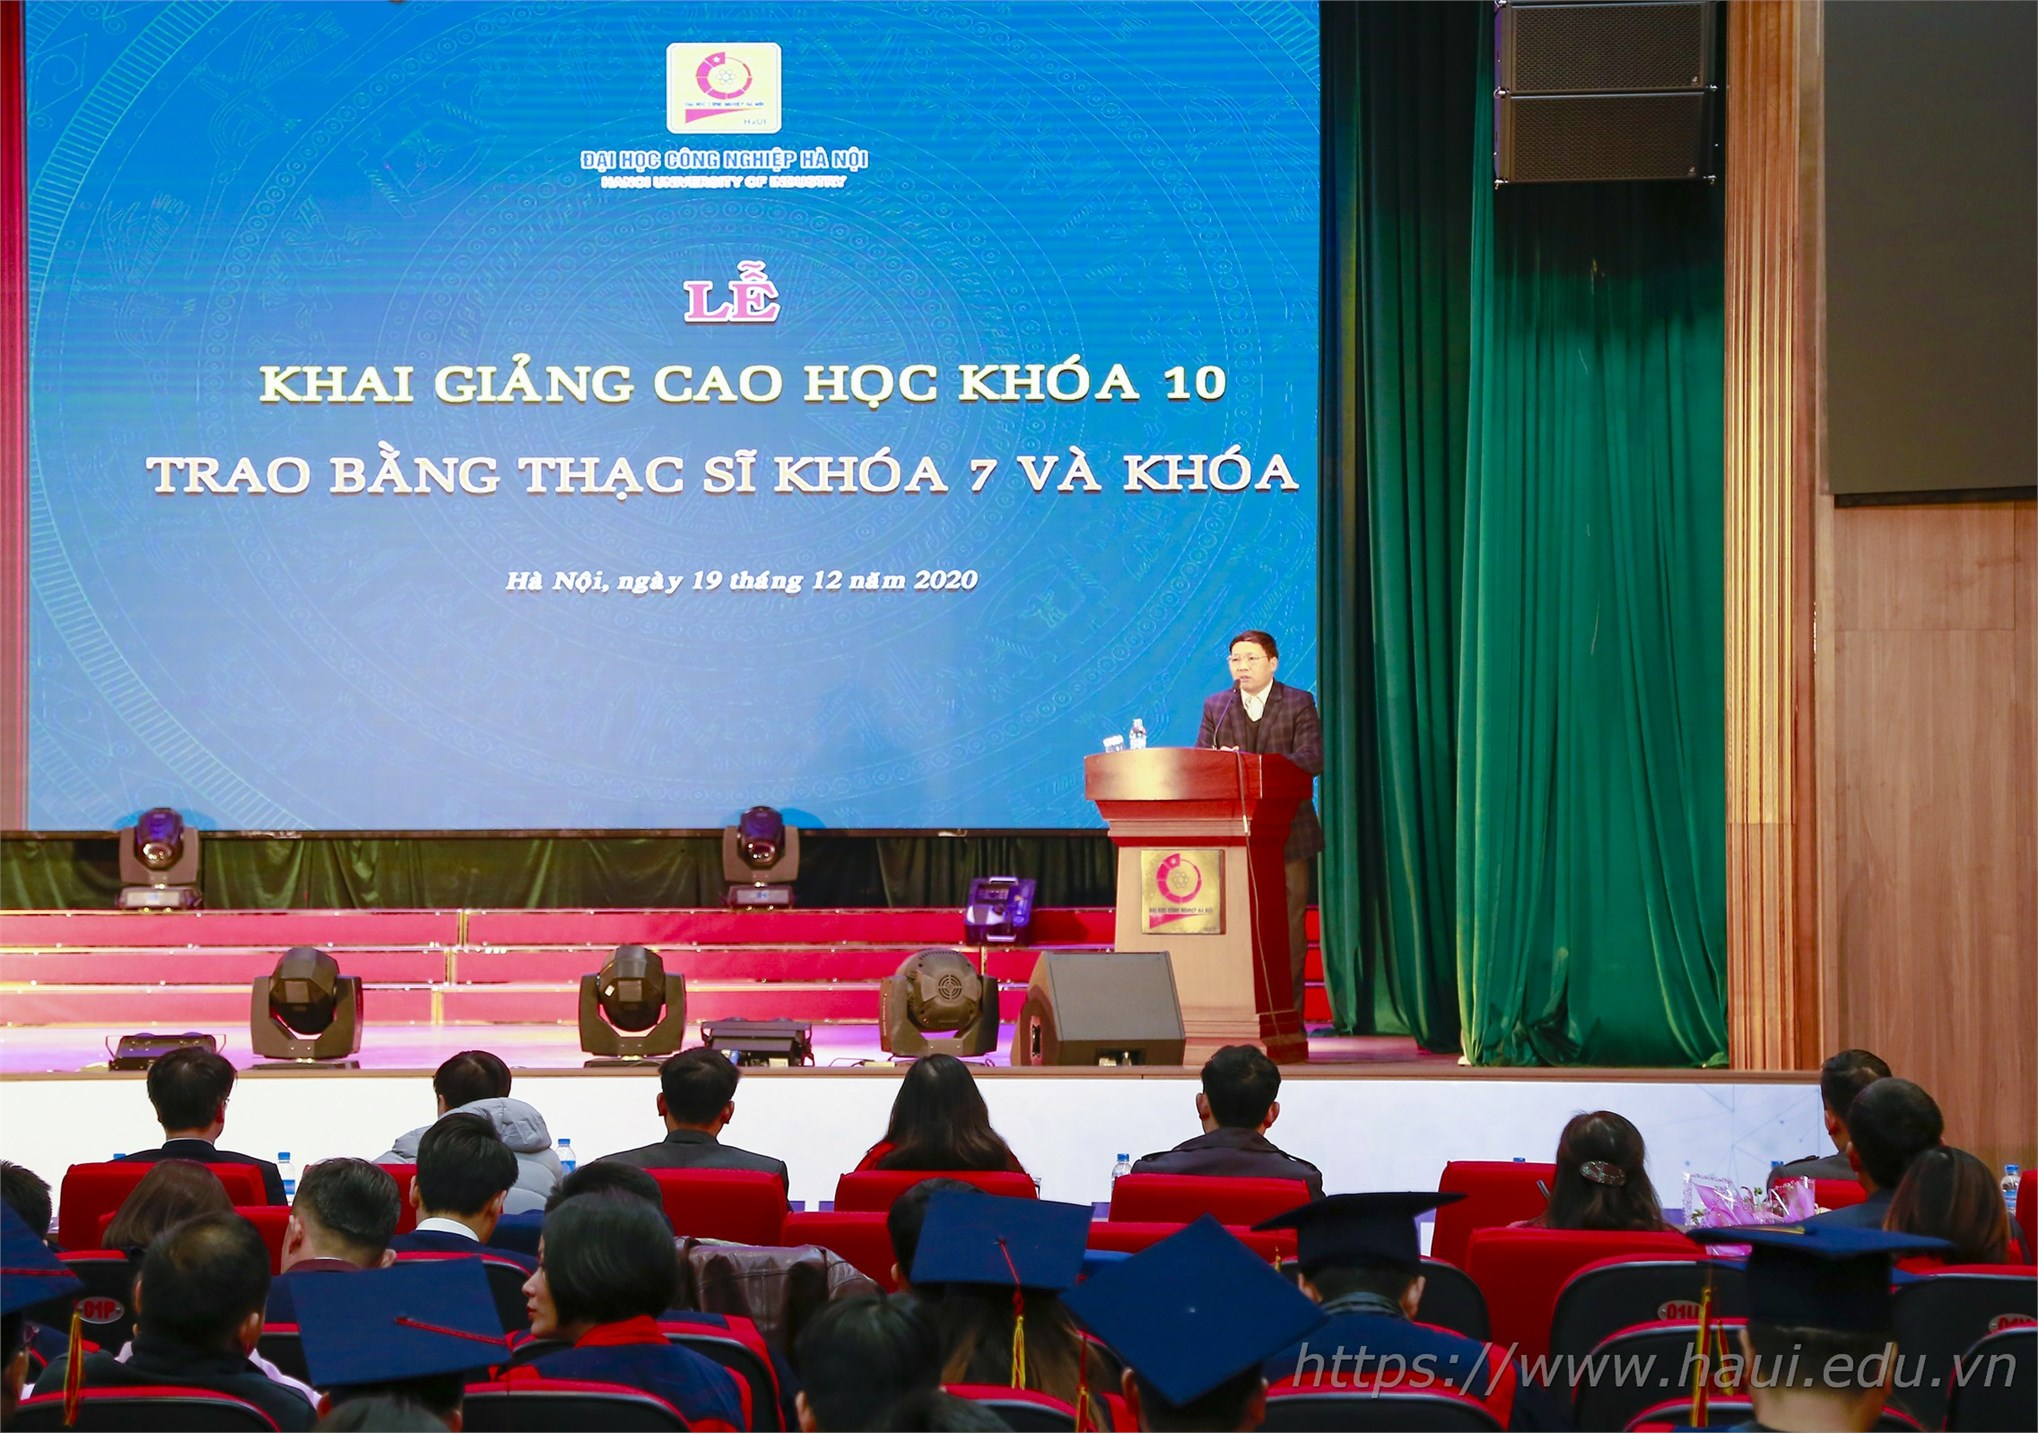 Opening Ceremony and Graduation & Master Degree Award Ceremony